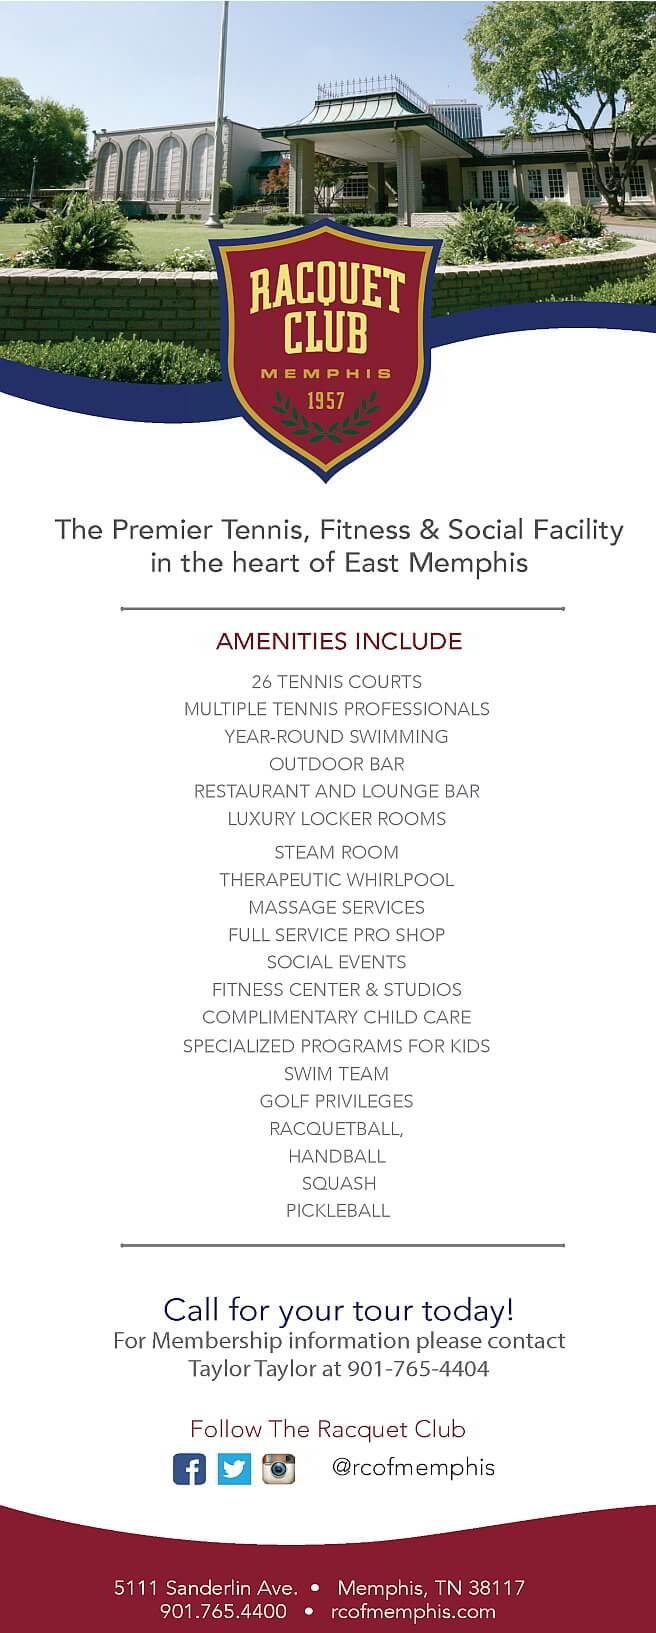 Racquet Club of Memphis